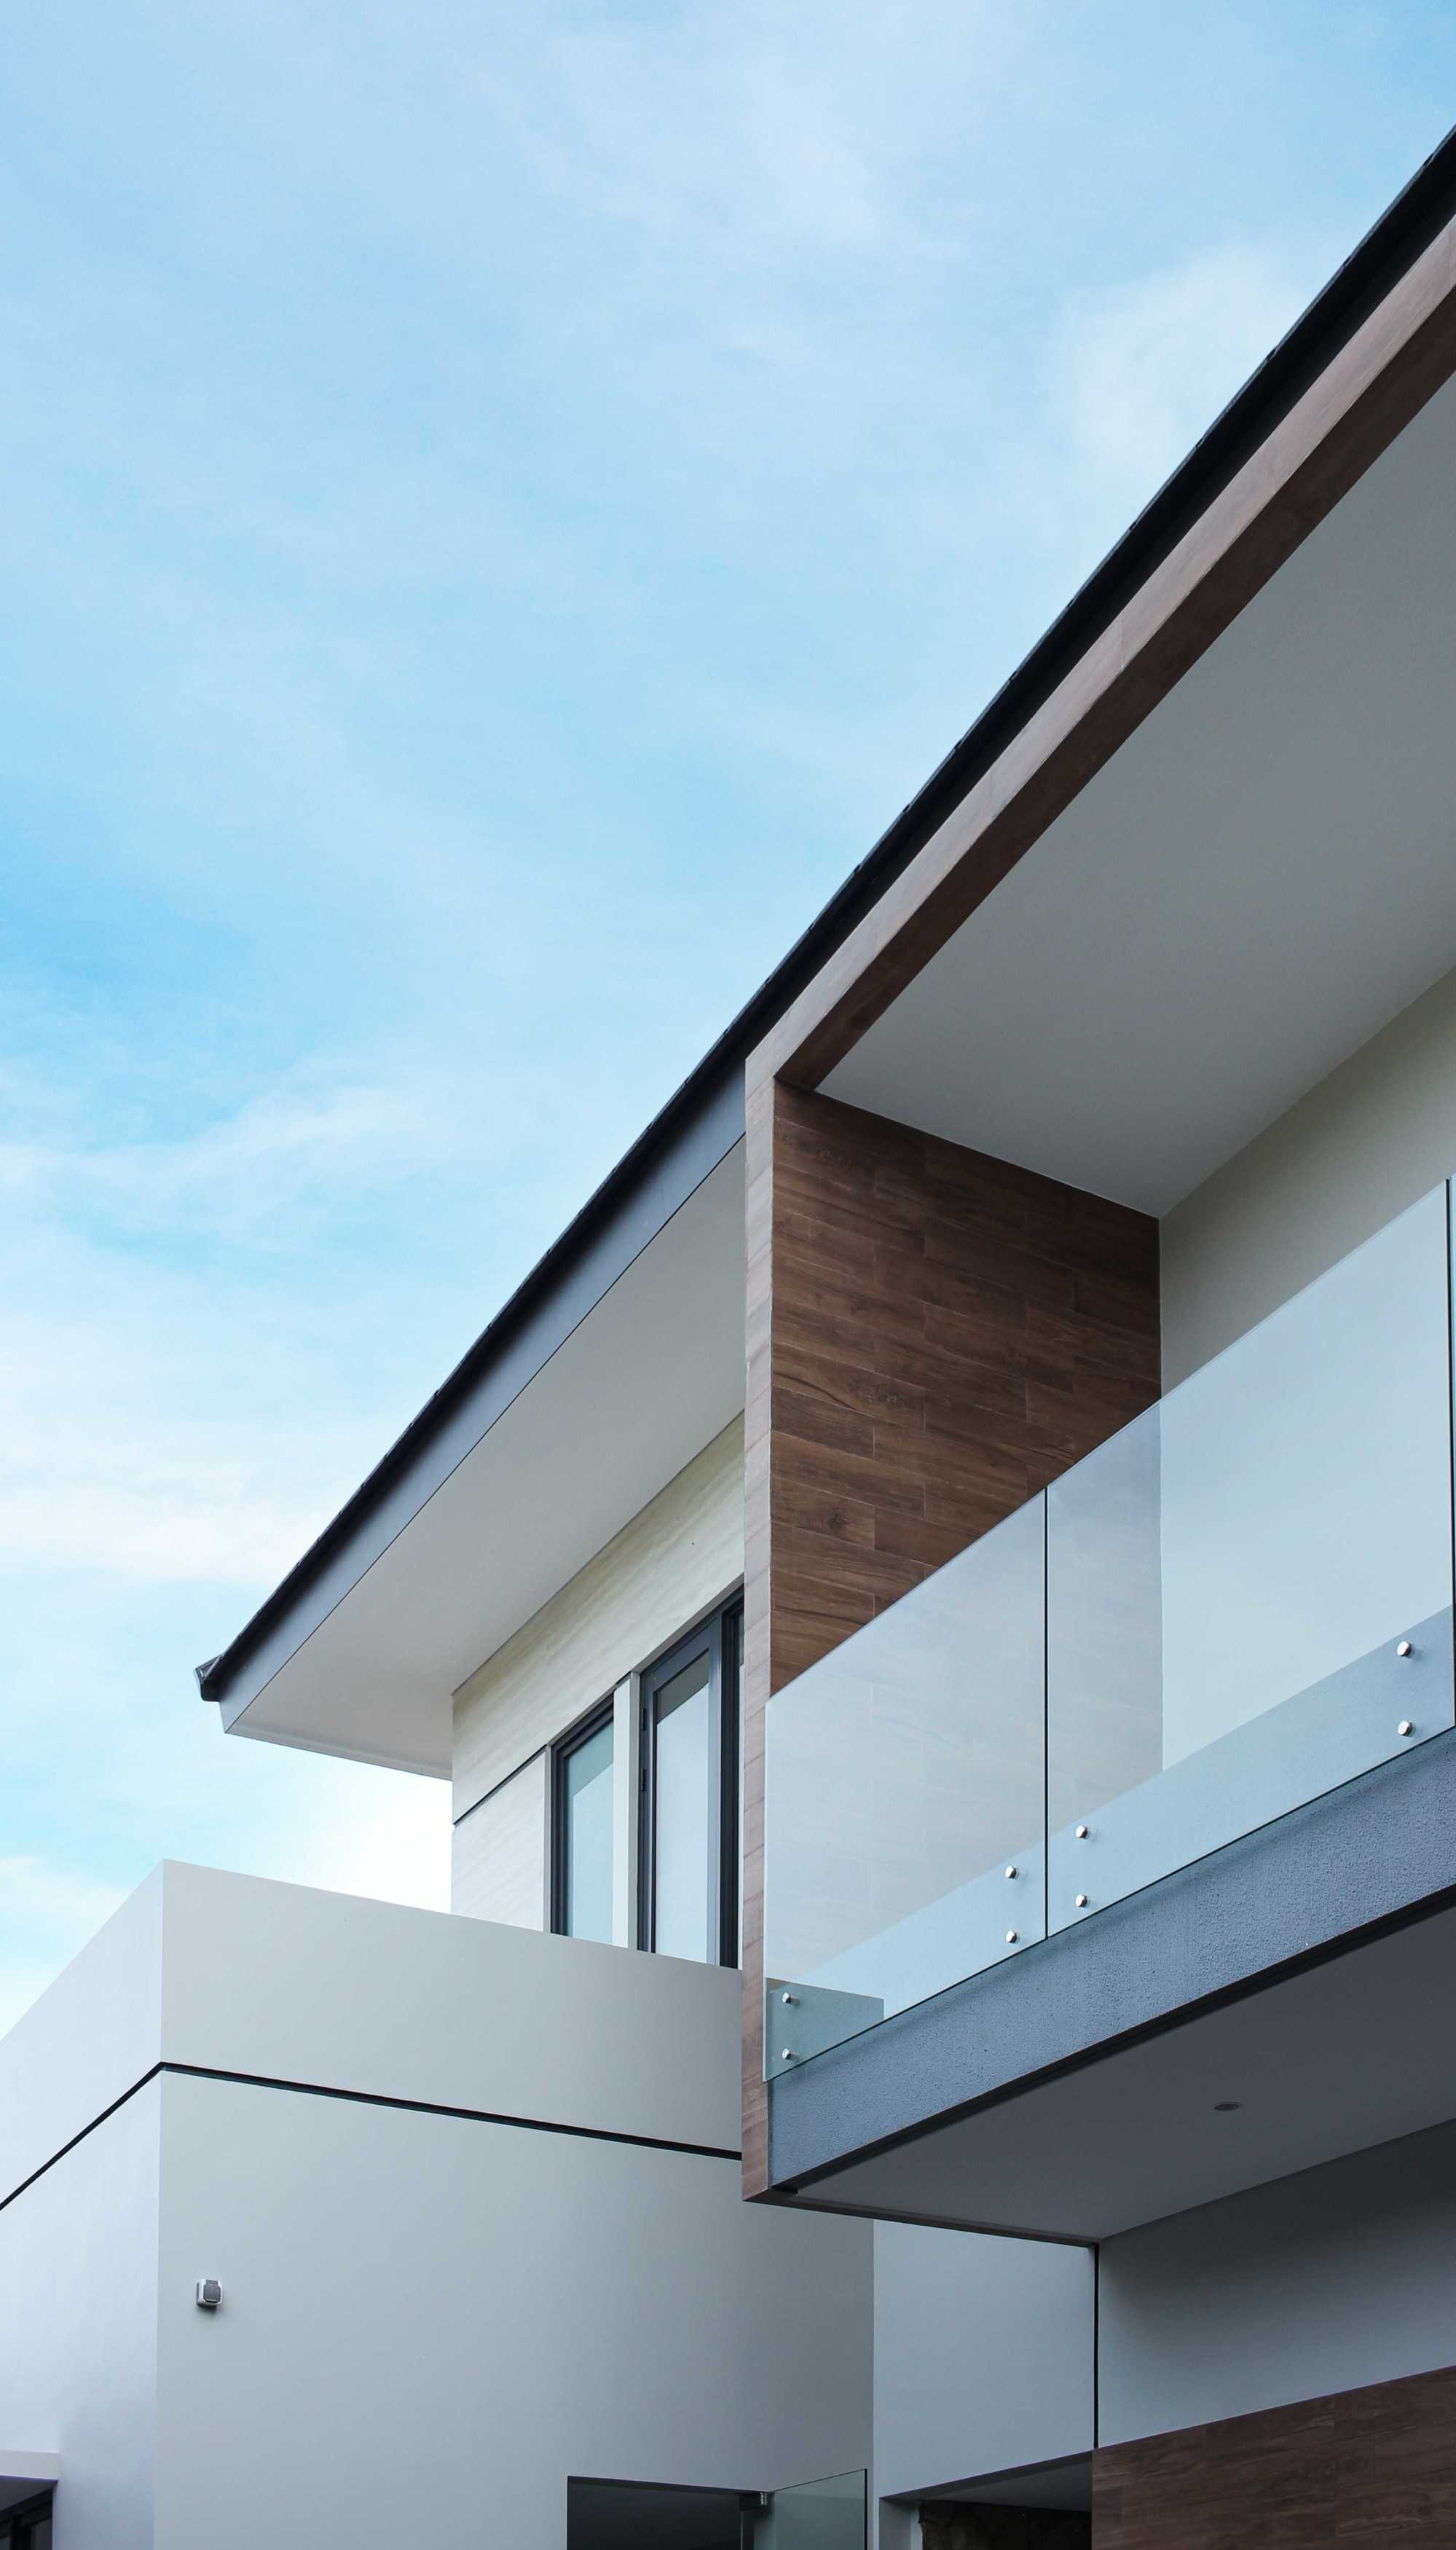 Y0 Design Architect S House Kec. Srono, Kabupaten Banyuwangi, Jawa Timur, Indonesia Kec. Srono, Kabupaten Banyuwangi, Jawa Timur, Indonesia Yohanes-Iswara-Limandjaya-S-House   121085